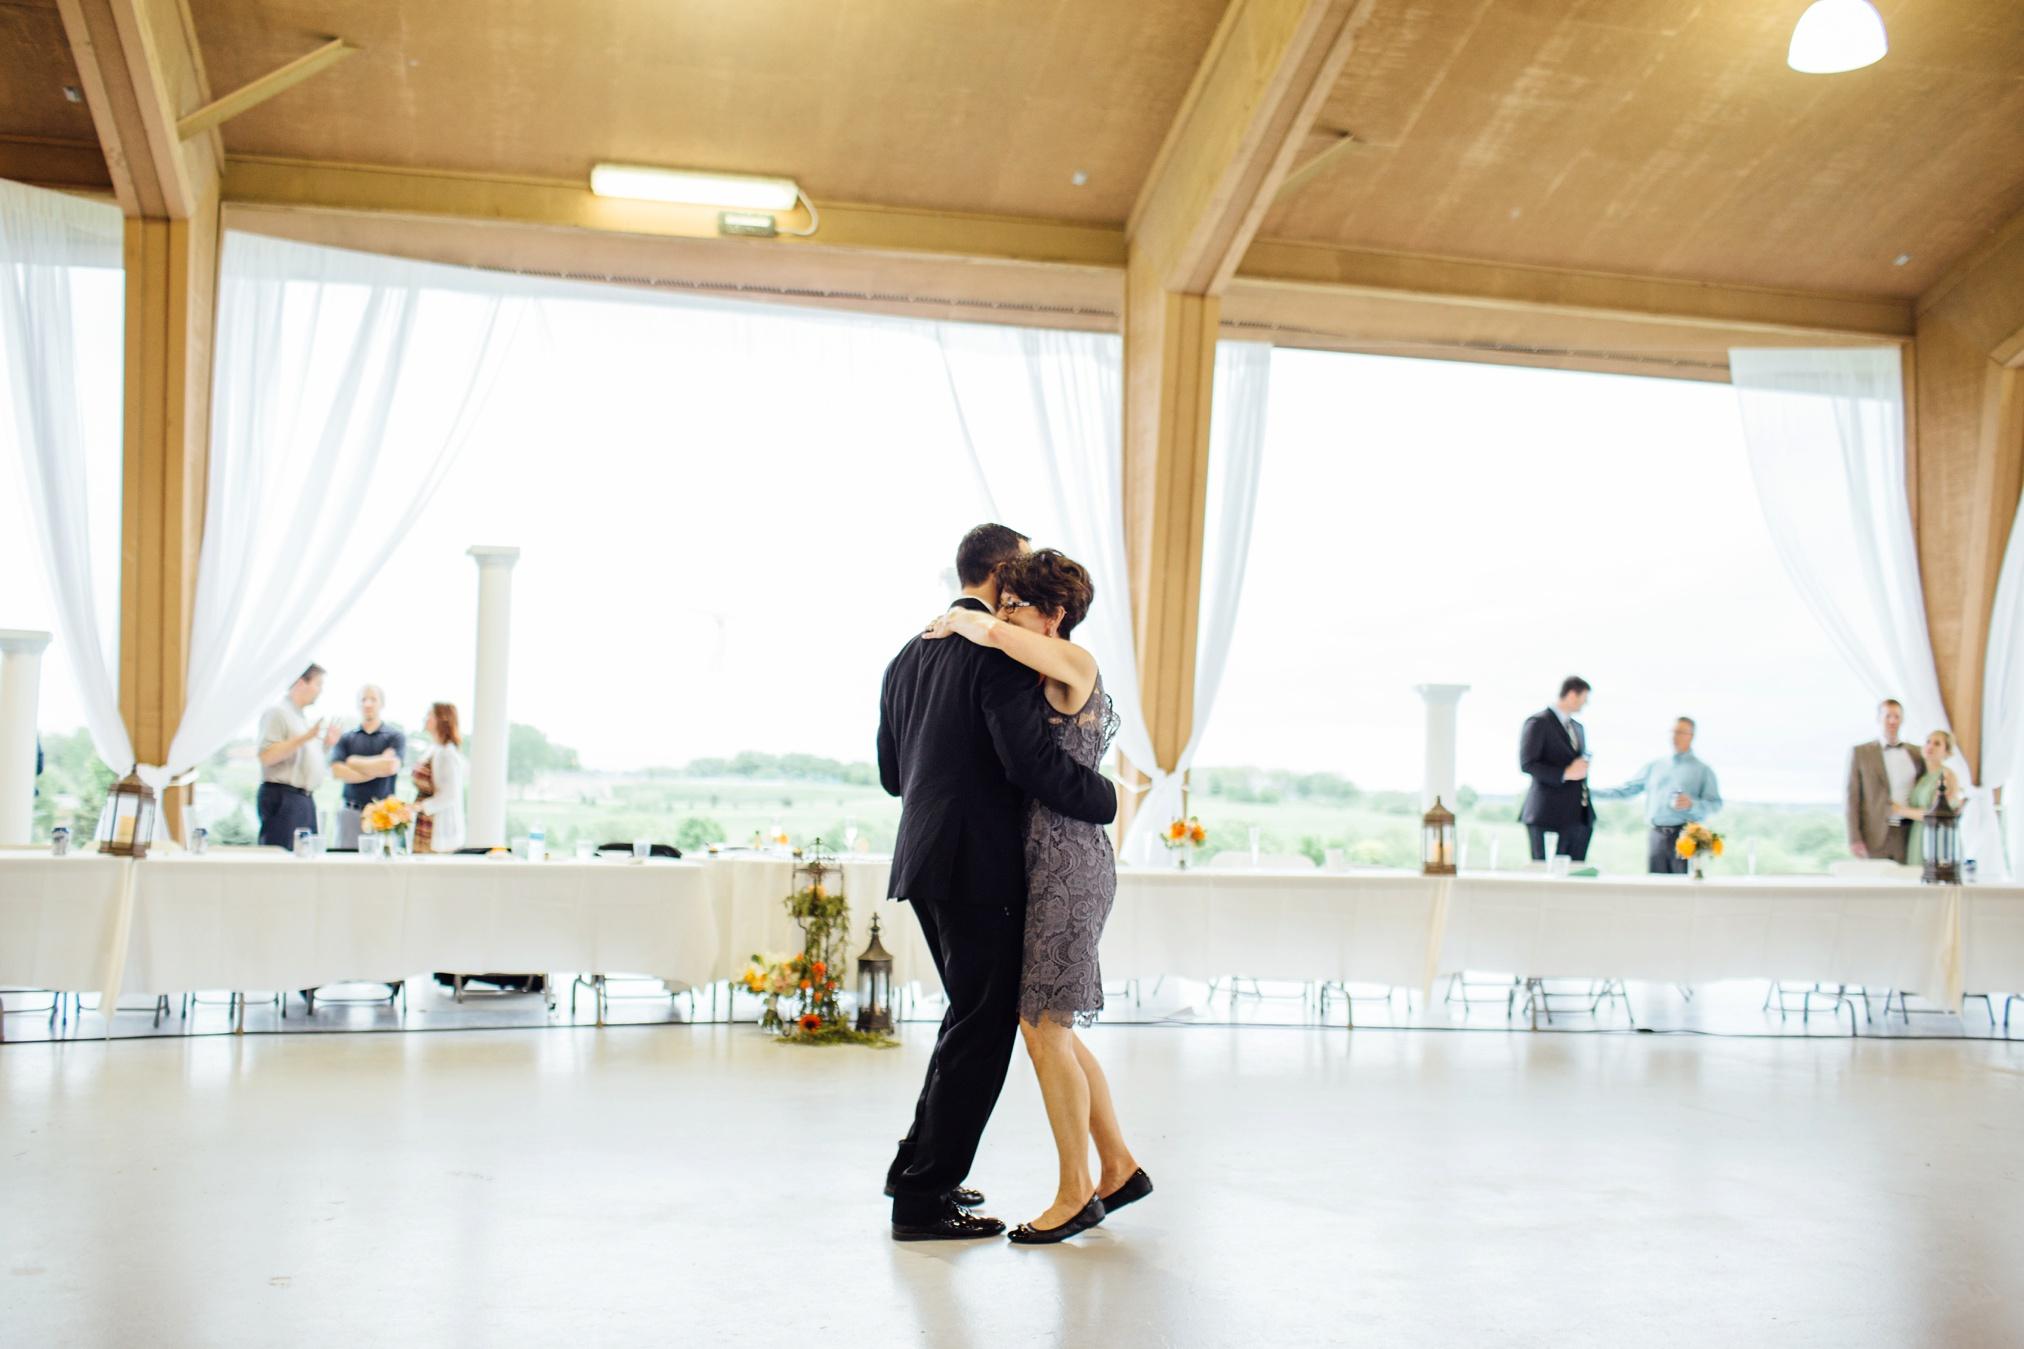 schmid_wedding-789.jpg